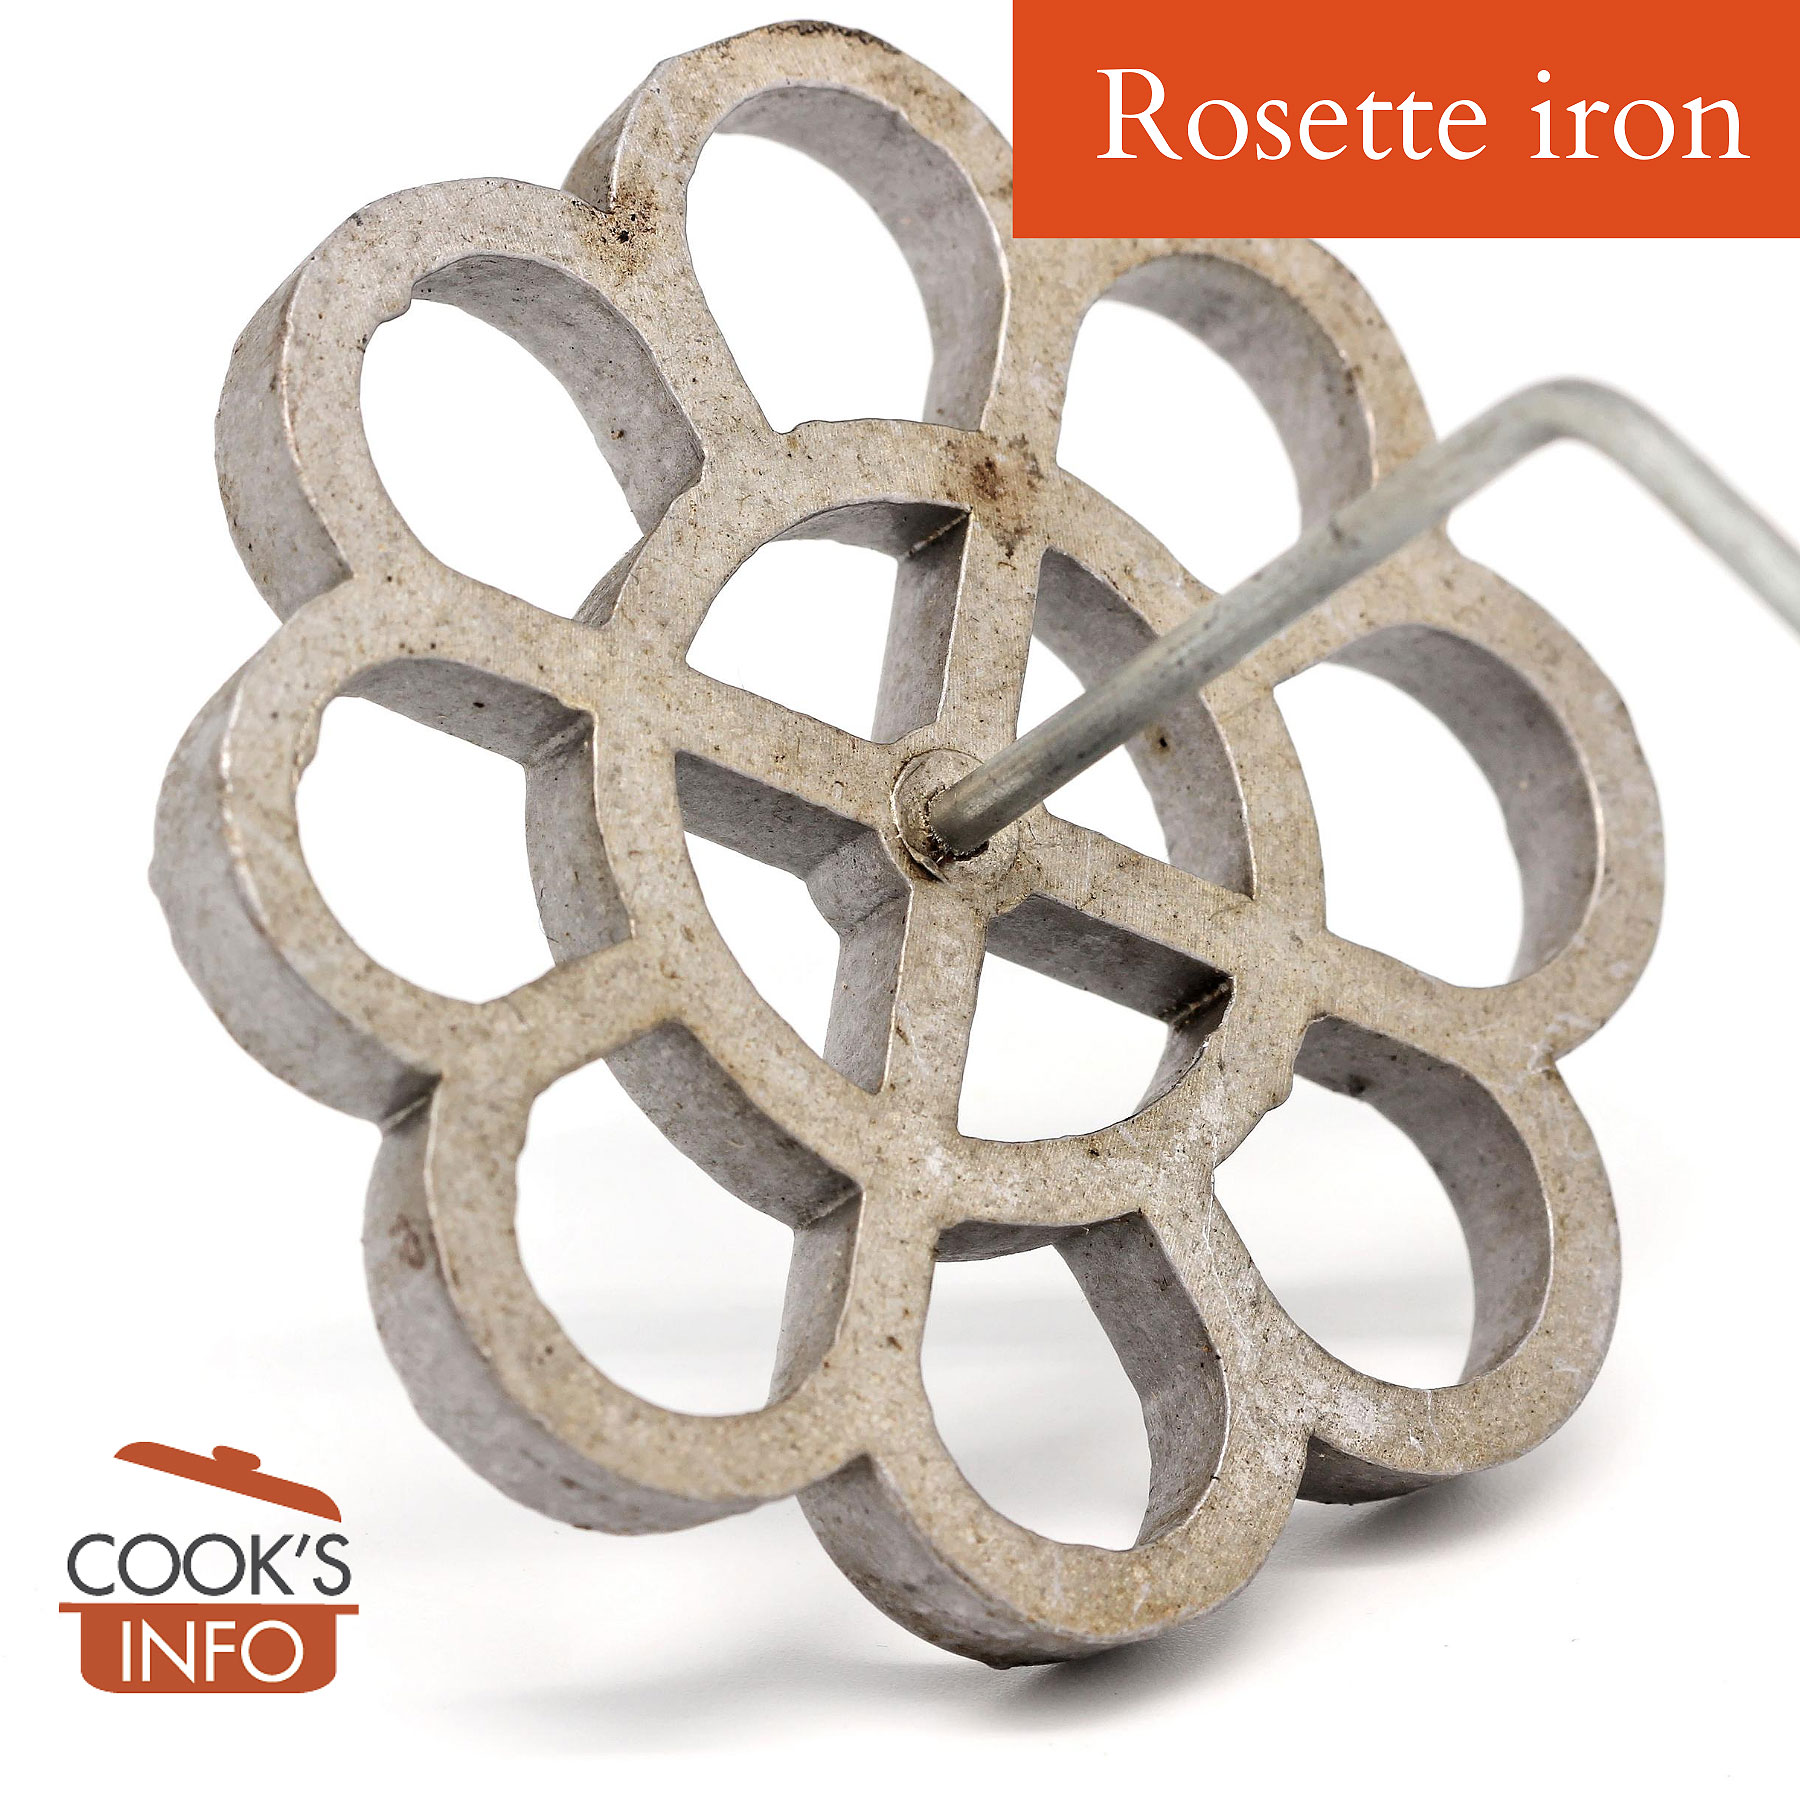 Rosette mould iron